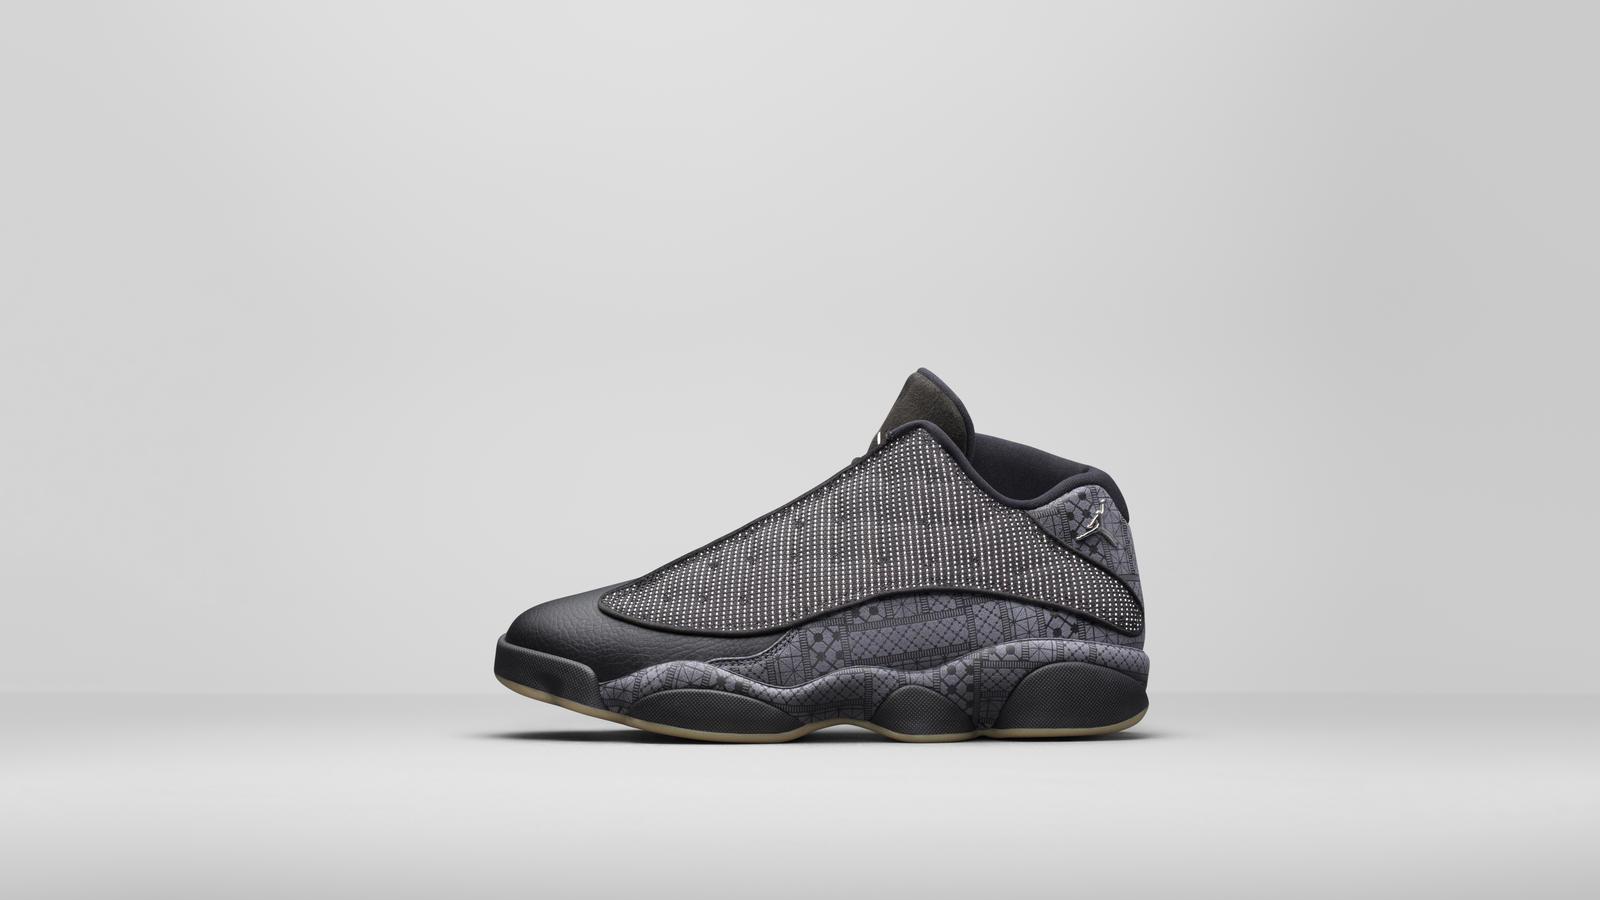 Jordan Brand célèbre les 30 ans de la marque en europe Nike News